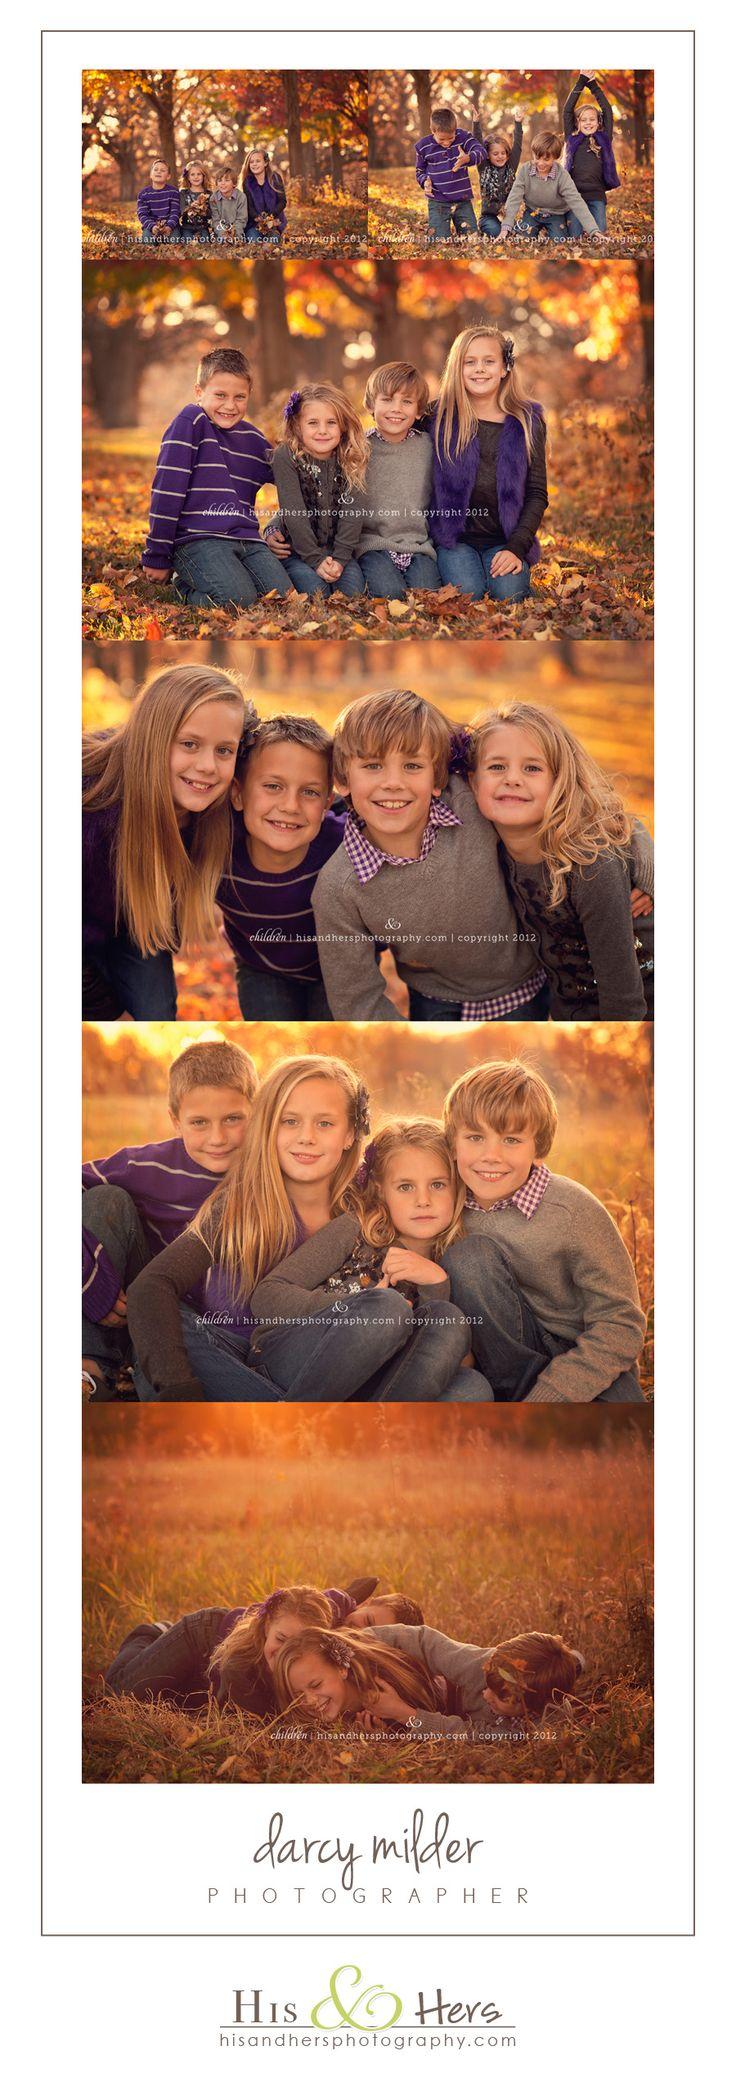 family portraits children's photographer family pictures photography des moines iowa photo studio